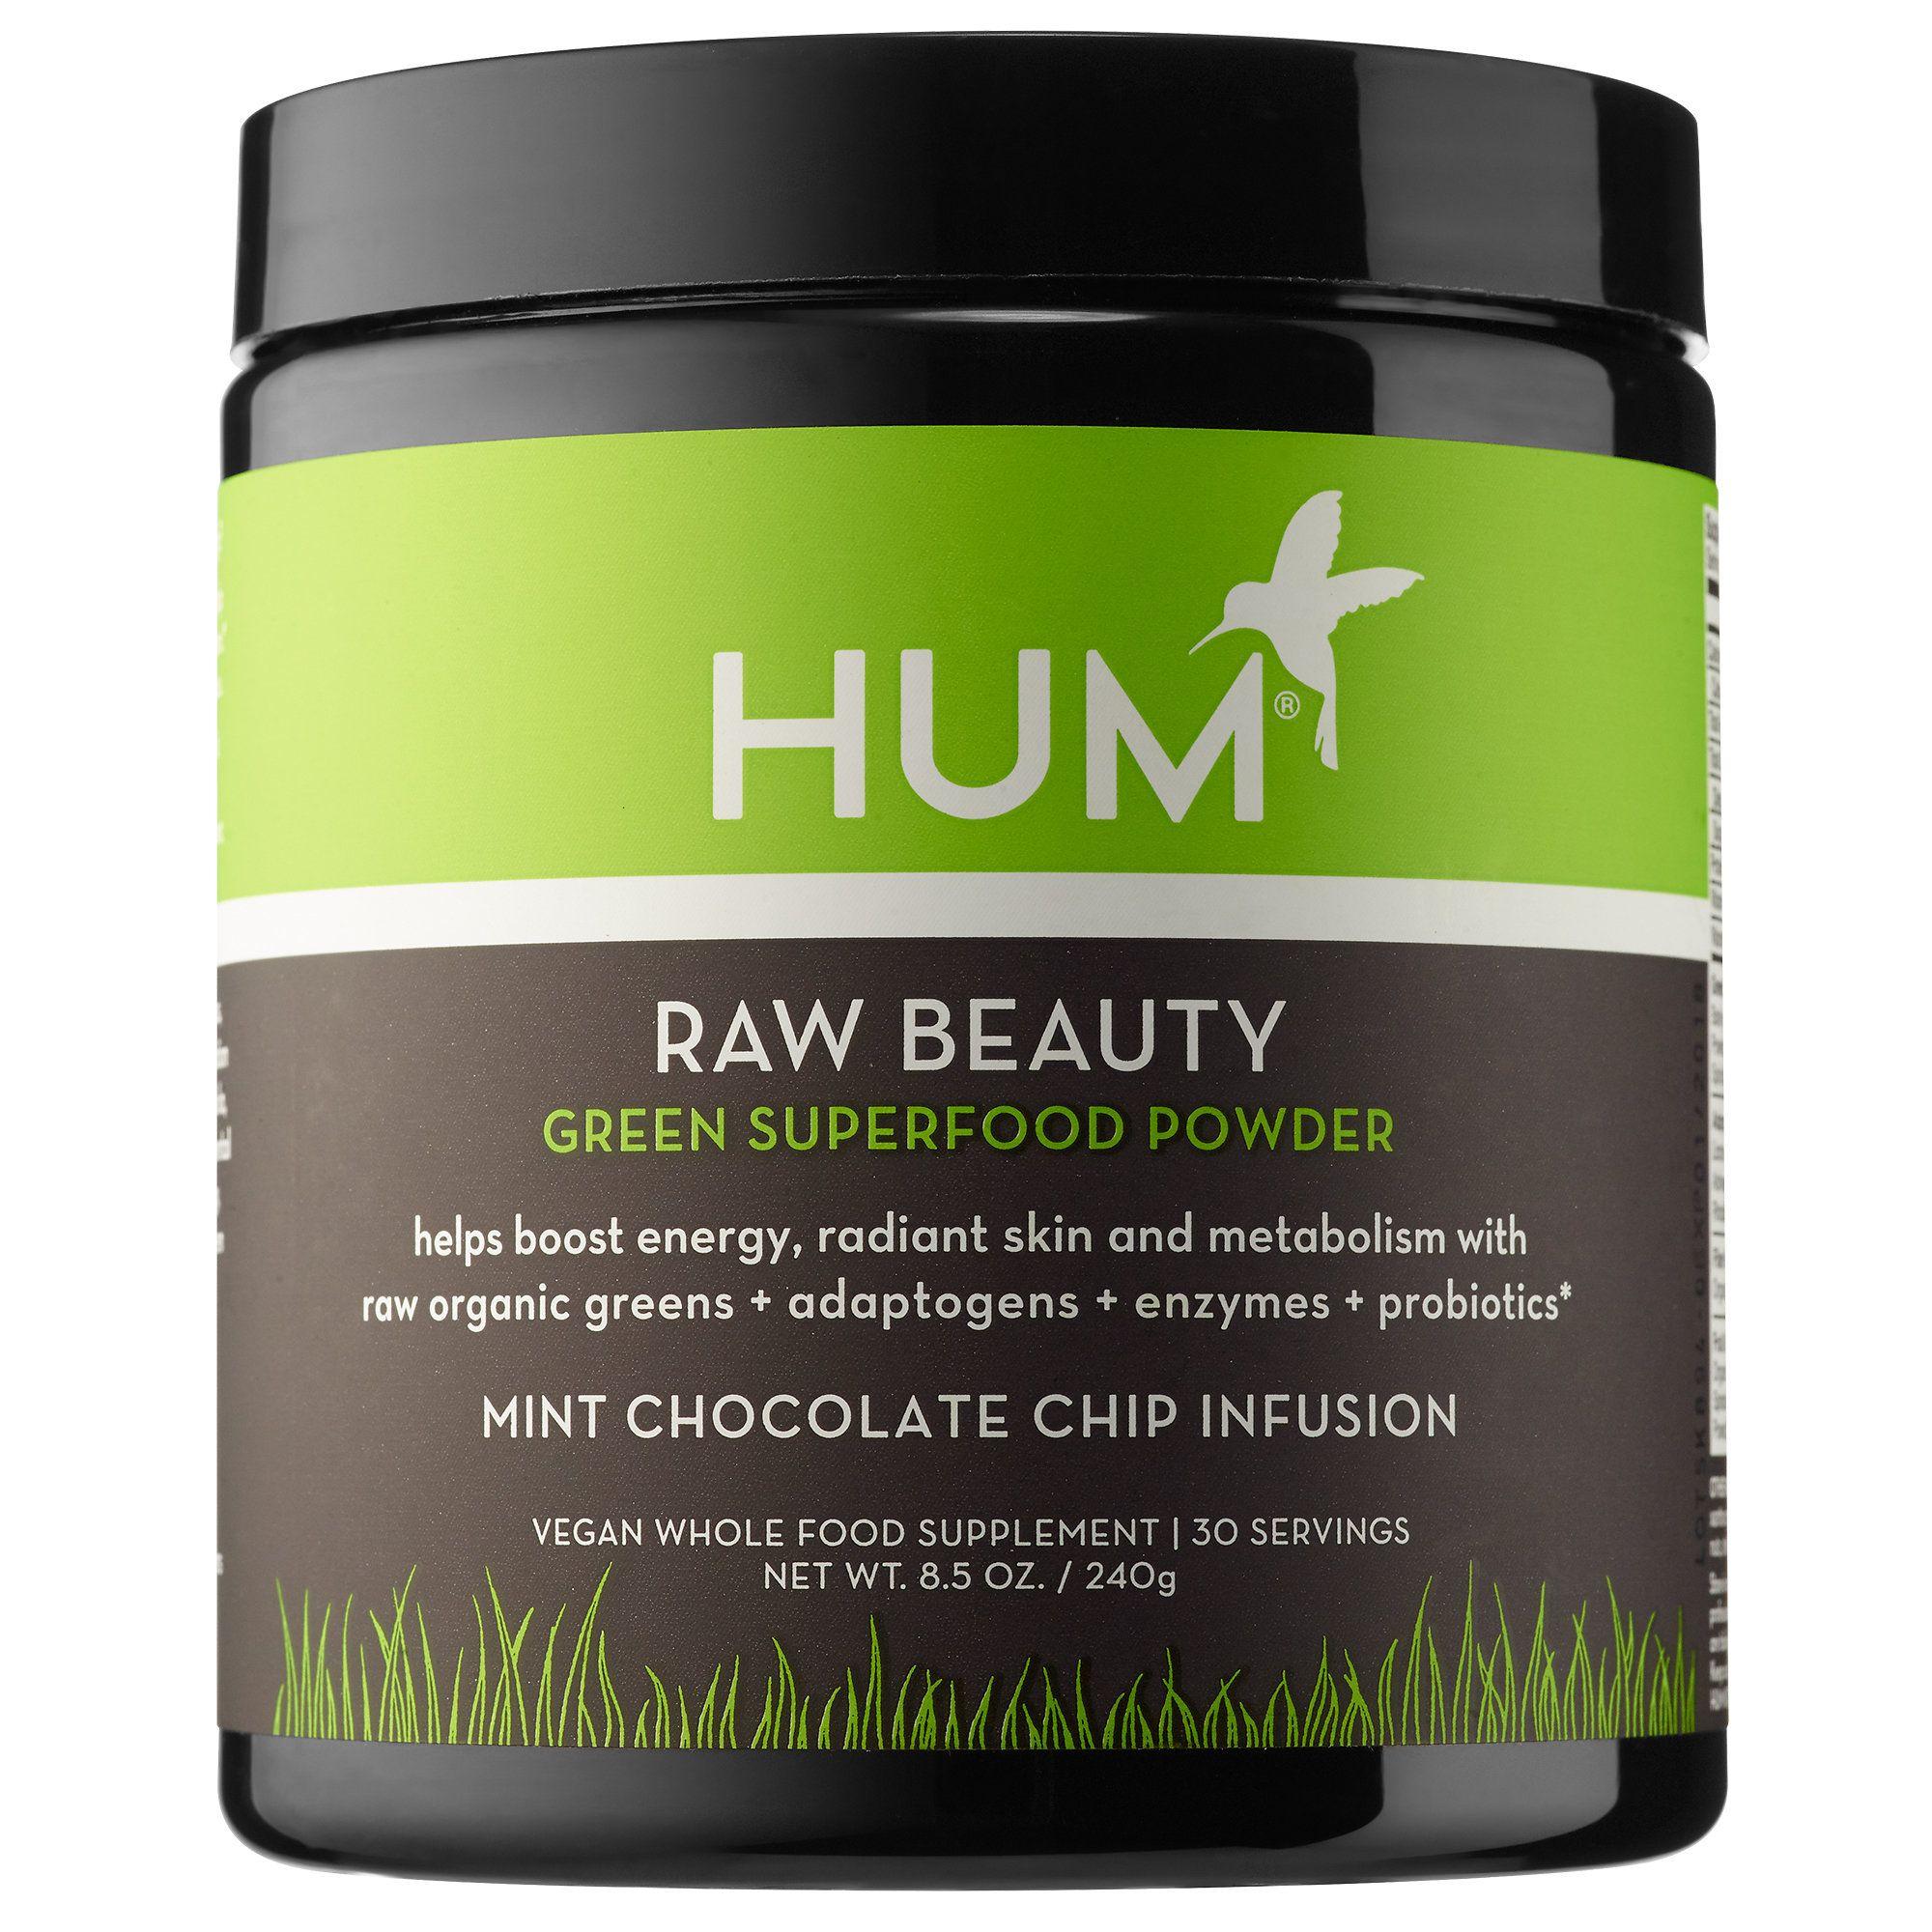 Raw Beauty Skin Energy Green Superfood Powder Hum Nutrition Sephora Green Superfood Powder Green Superfood Hum Nutrition